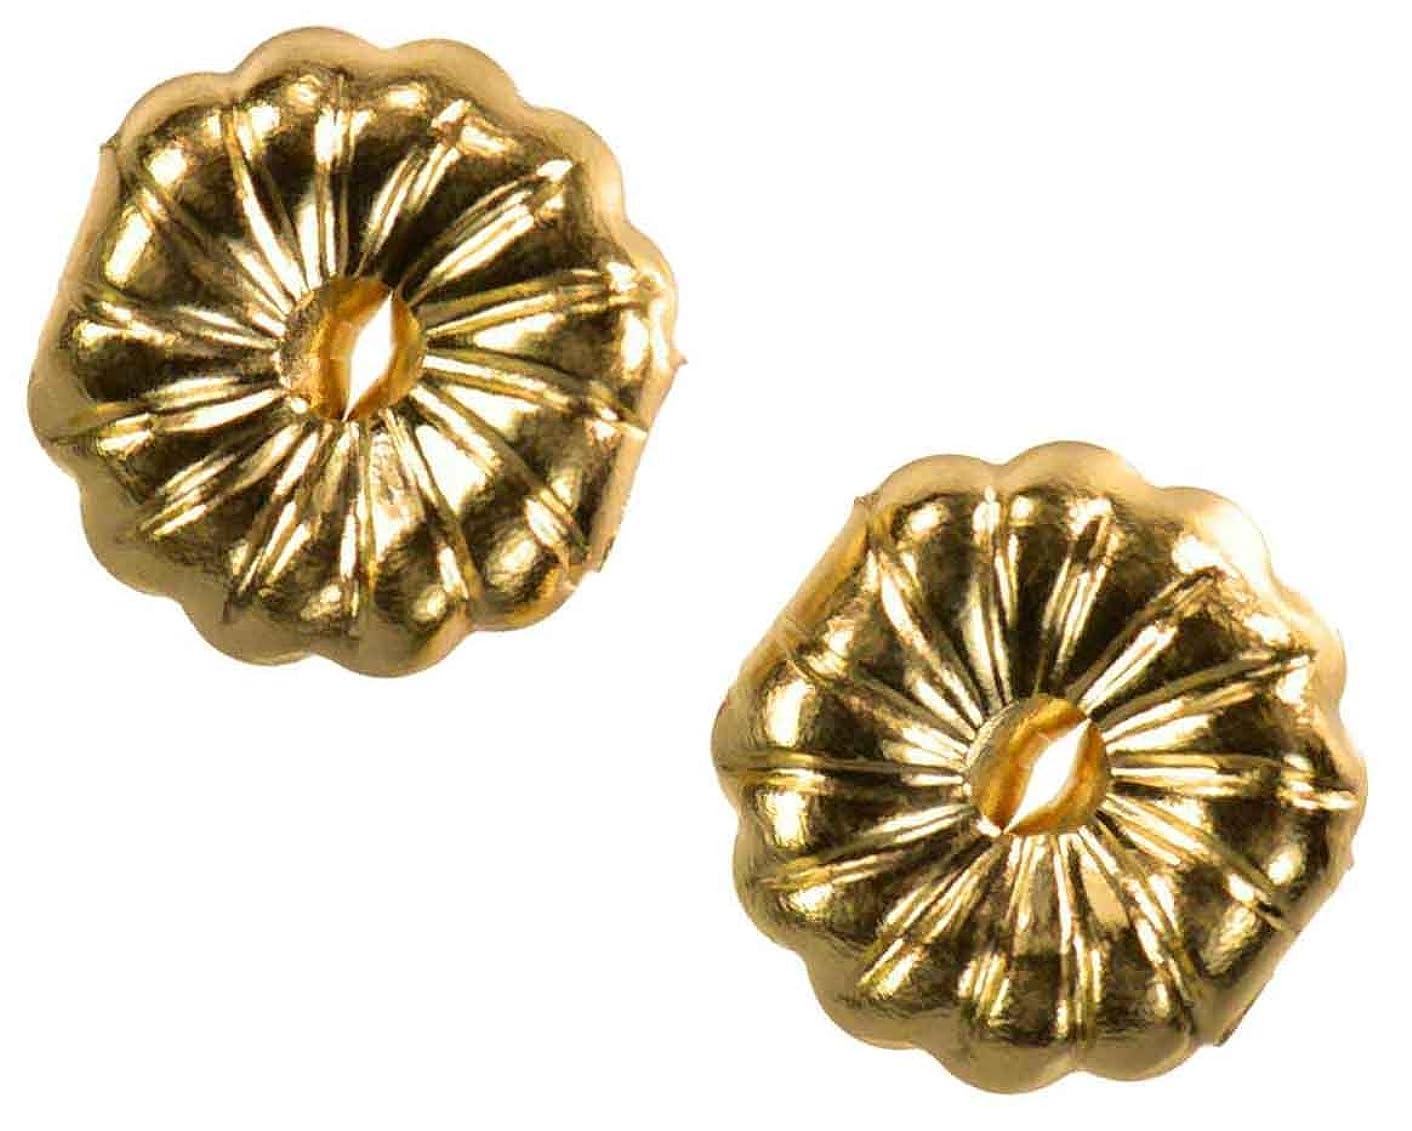 Solid 14K Yellow Gold Earring Backs Premium Swirl 9mm (1 Pair)